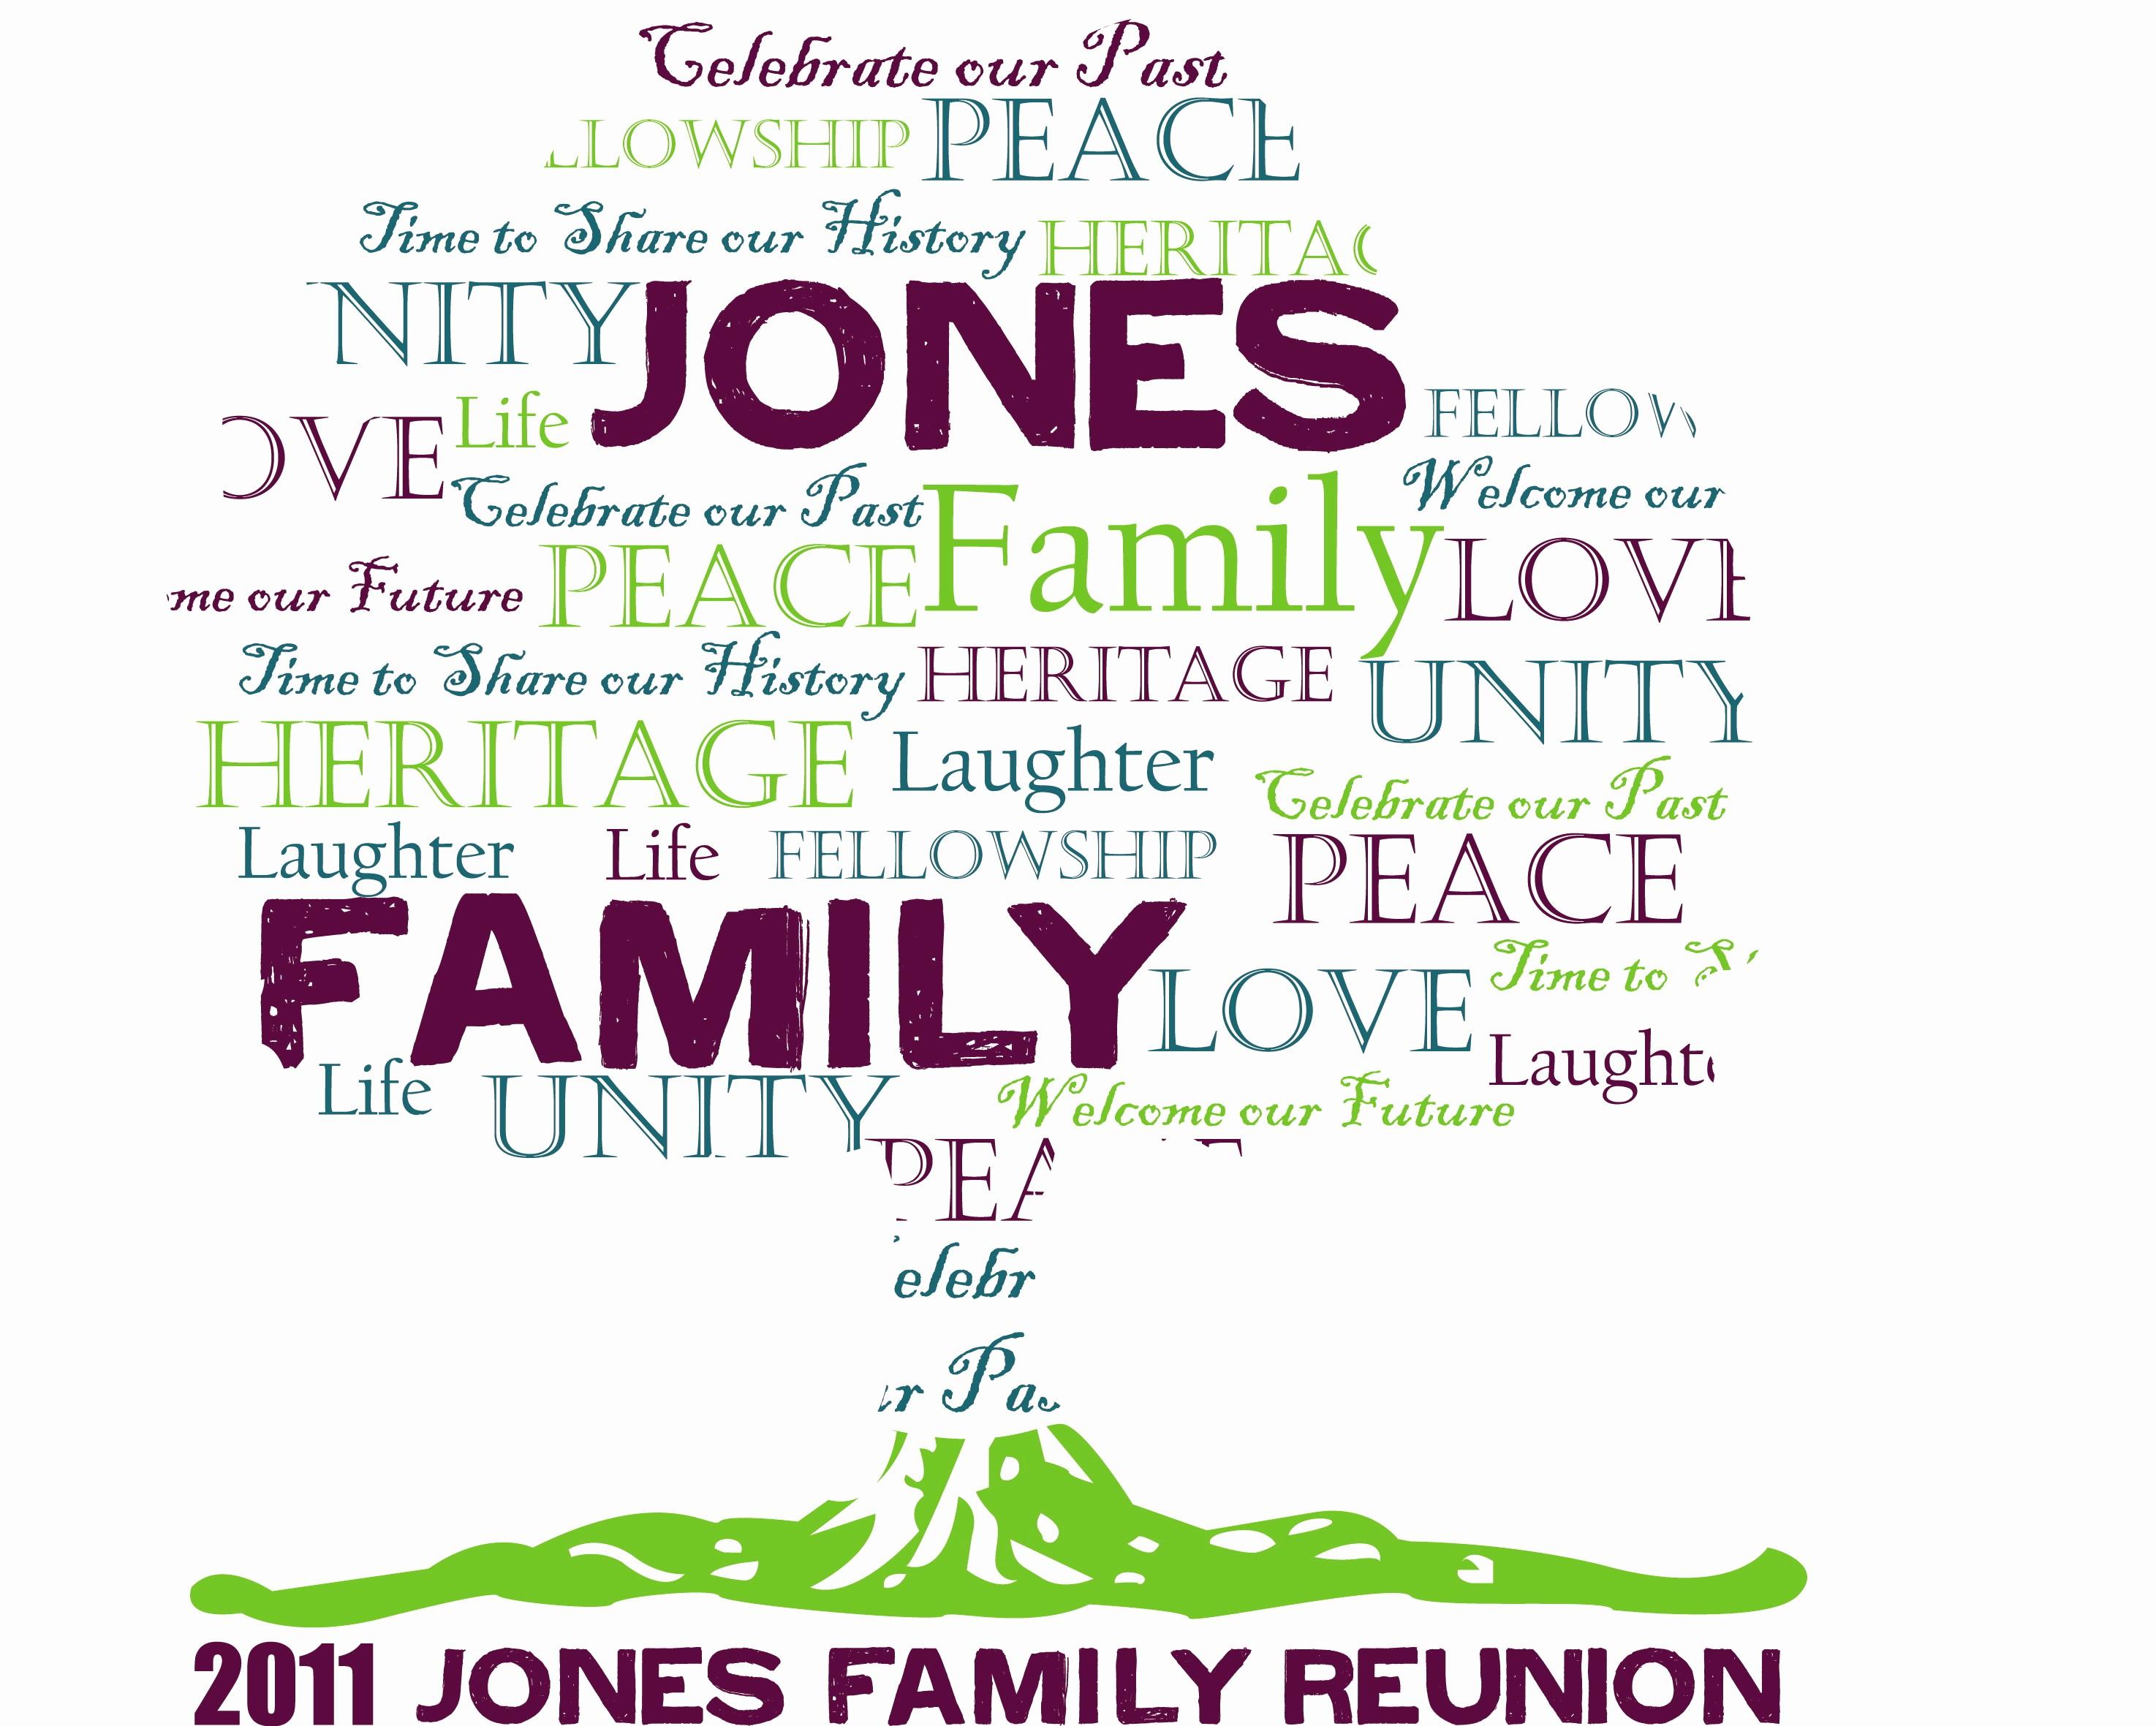 Free Family Reunion Flyers Templates New Family Reunion Invitation Template Portablegasgrillweber